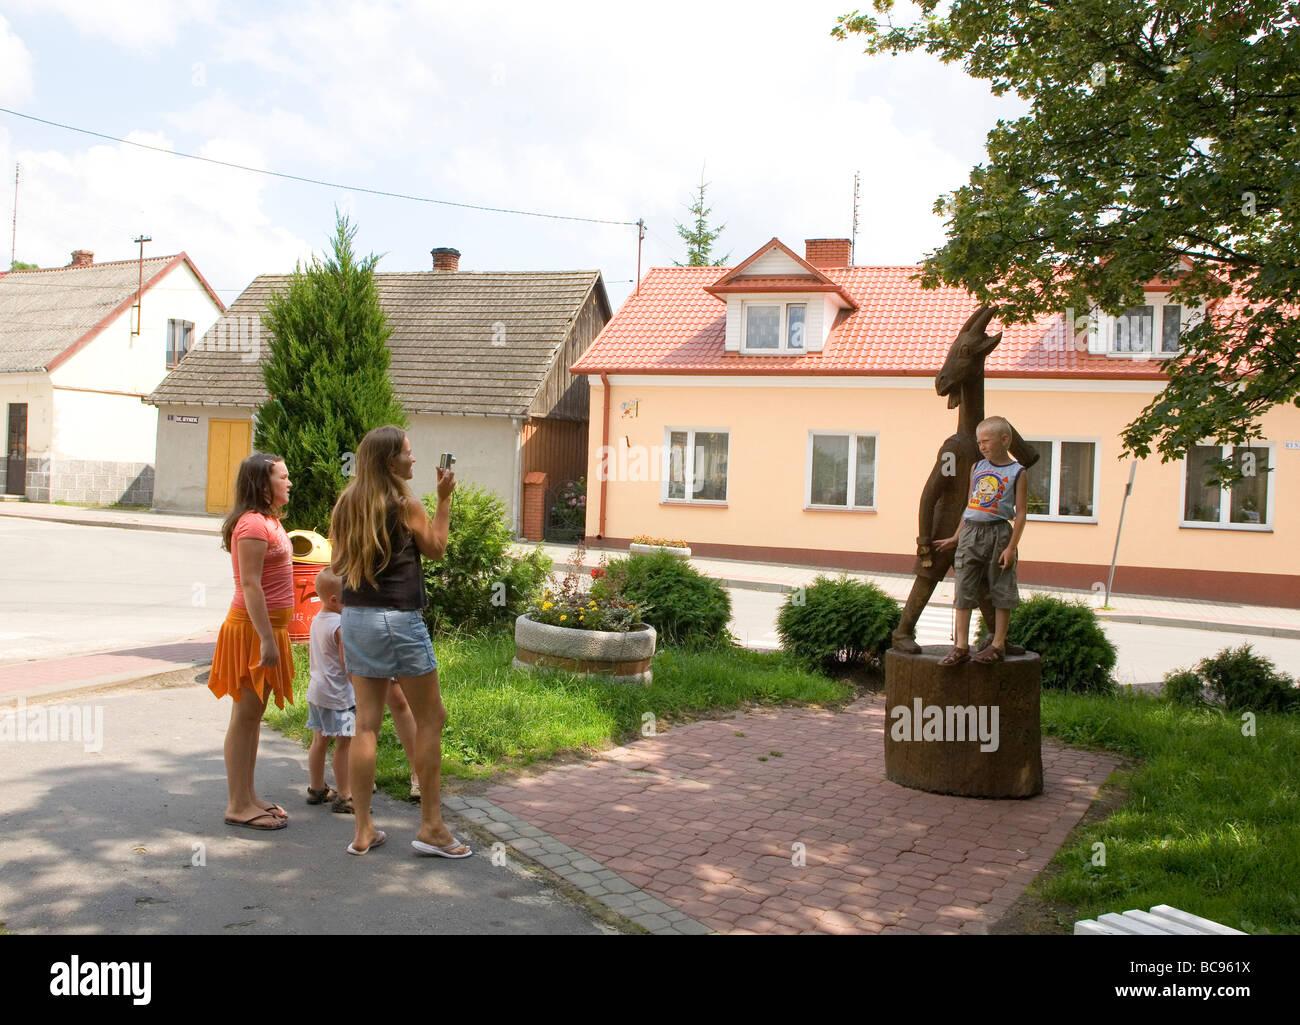 Pacanow town of children s fictional comics character Billy goat Koziolek Matolek Stock Photo